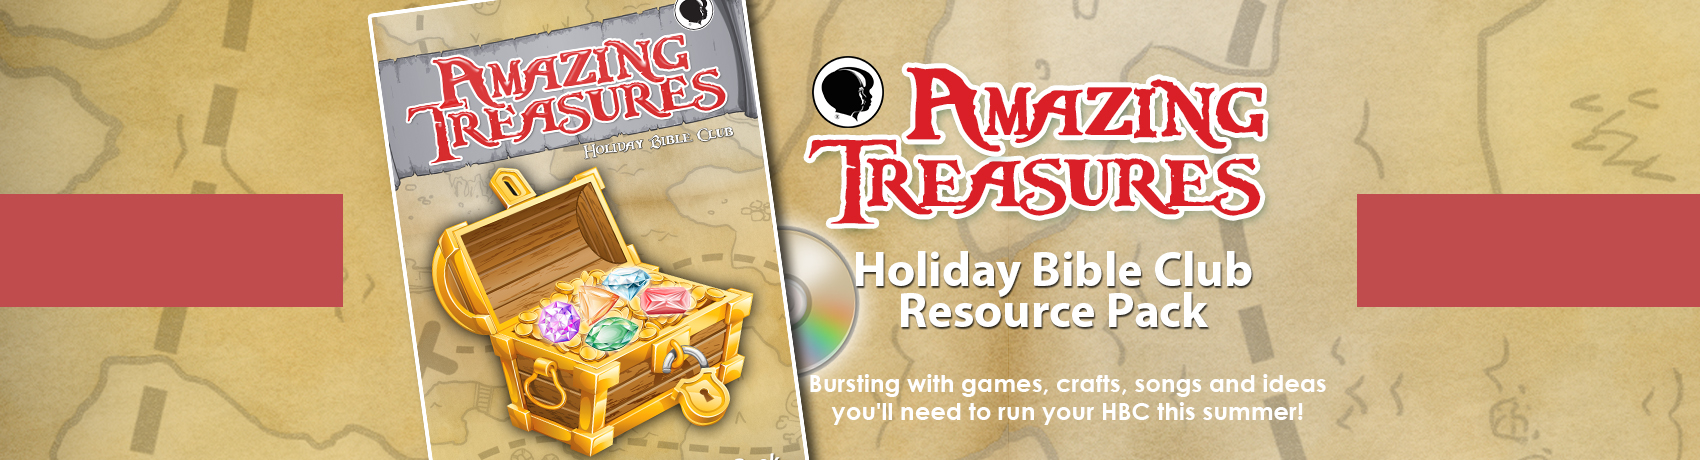 Amazing-Treasures-Web-Banner2